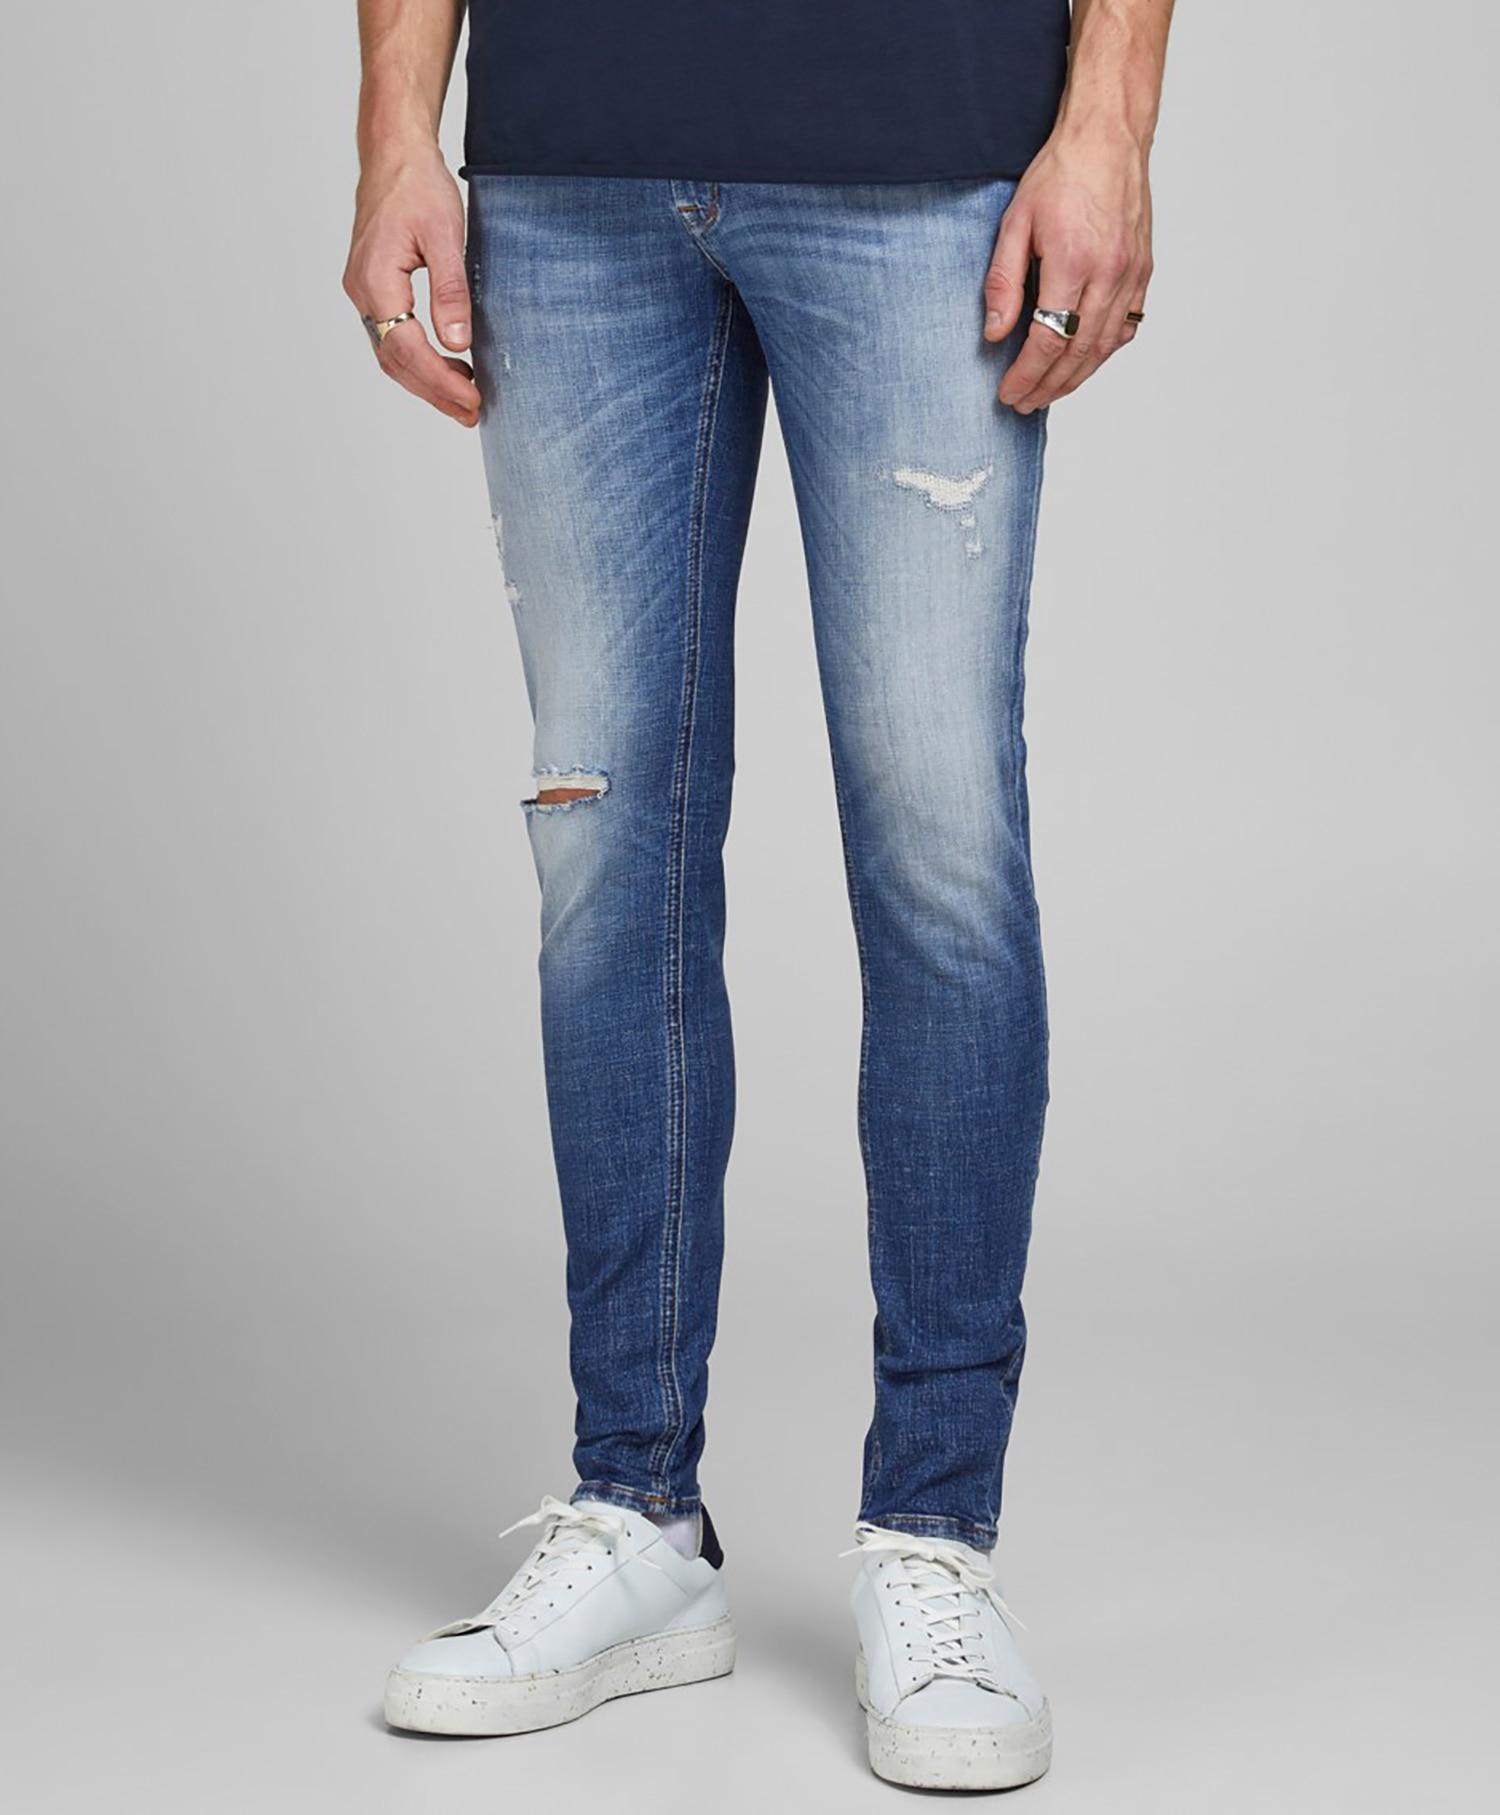 Jack&Jones Liam jeans